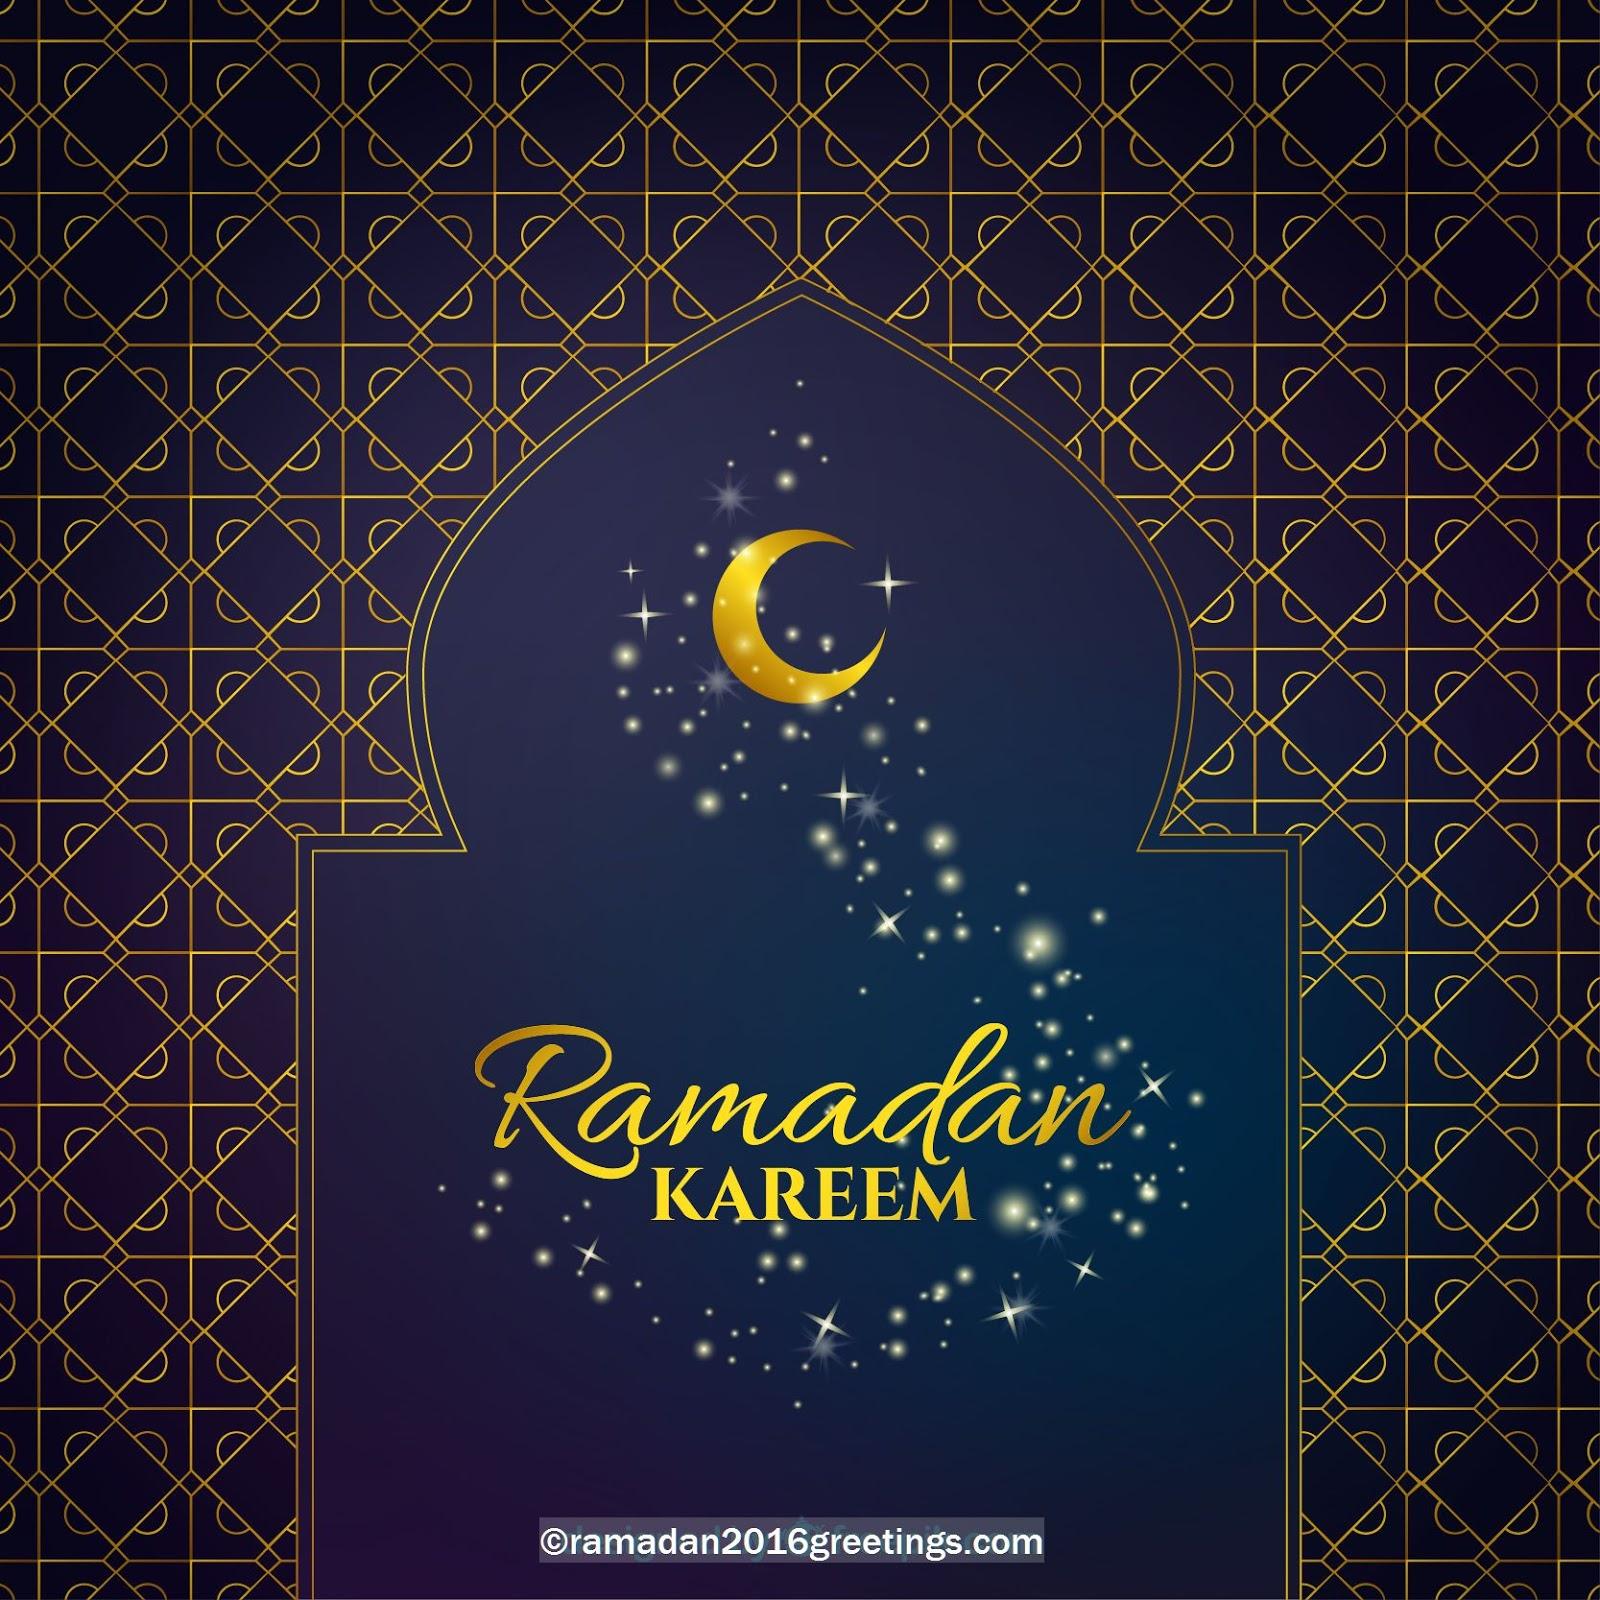 Ramadan 2016 ramadan greetings eid al fitr 2016 quotes ramadan also read ramadan 2016 high quality images for desktop kristyandbryce Choice Image